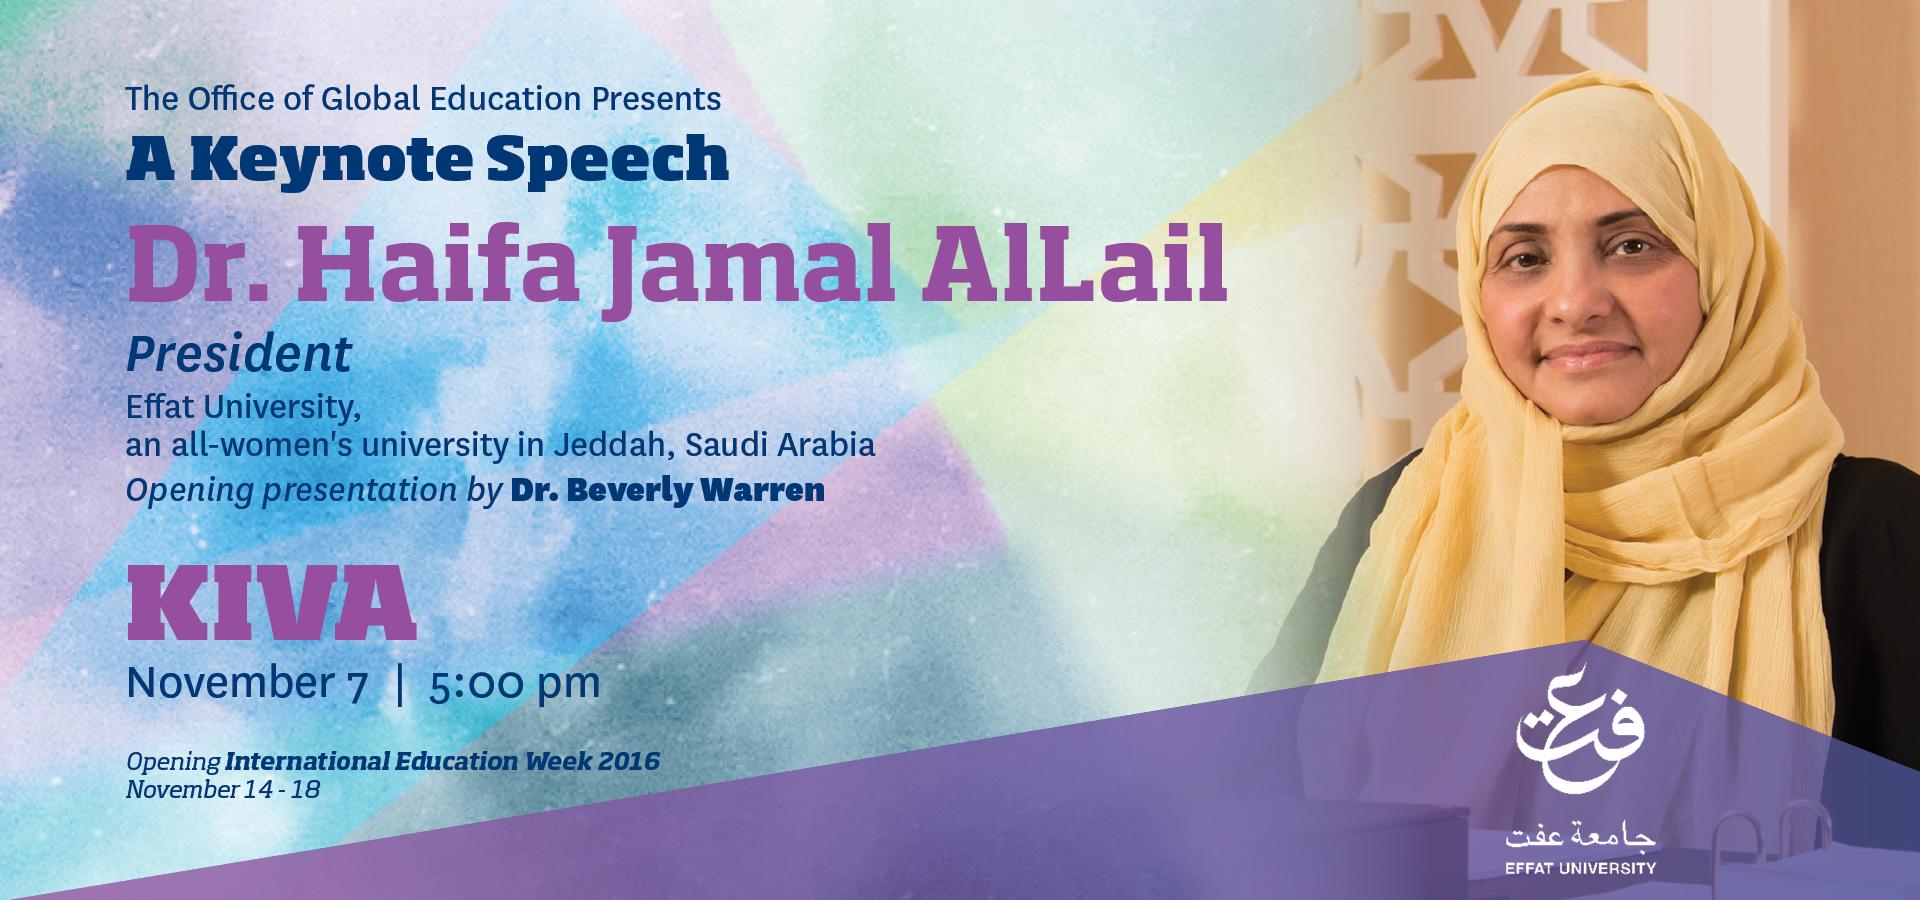 A Keynote Speech Dr. Haifa Jamal AlLail, President, Effat University, Opening presentation by Dr. Beverly Warren, KIVA, November 7  |  5:00 pm